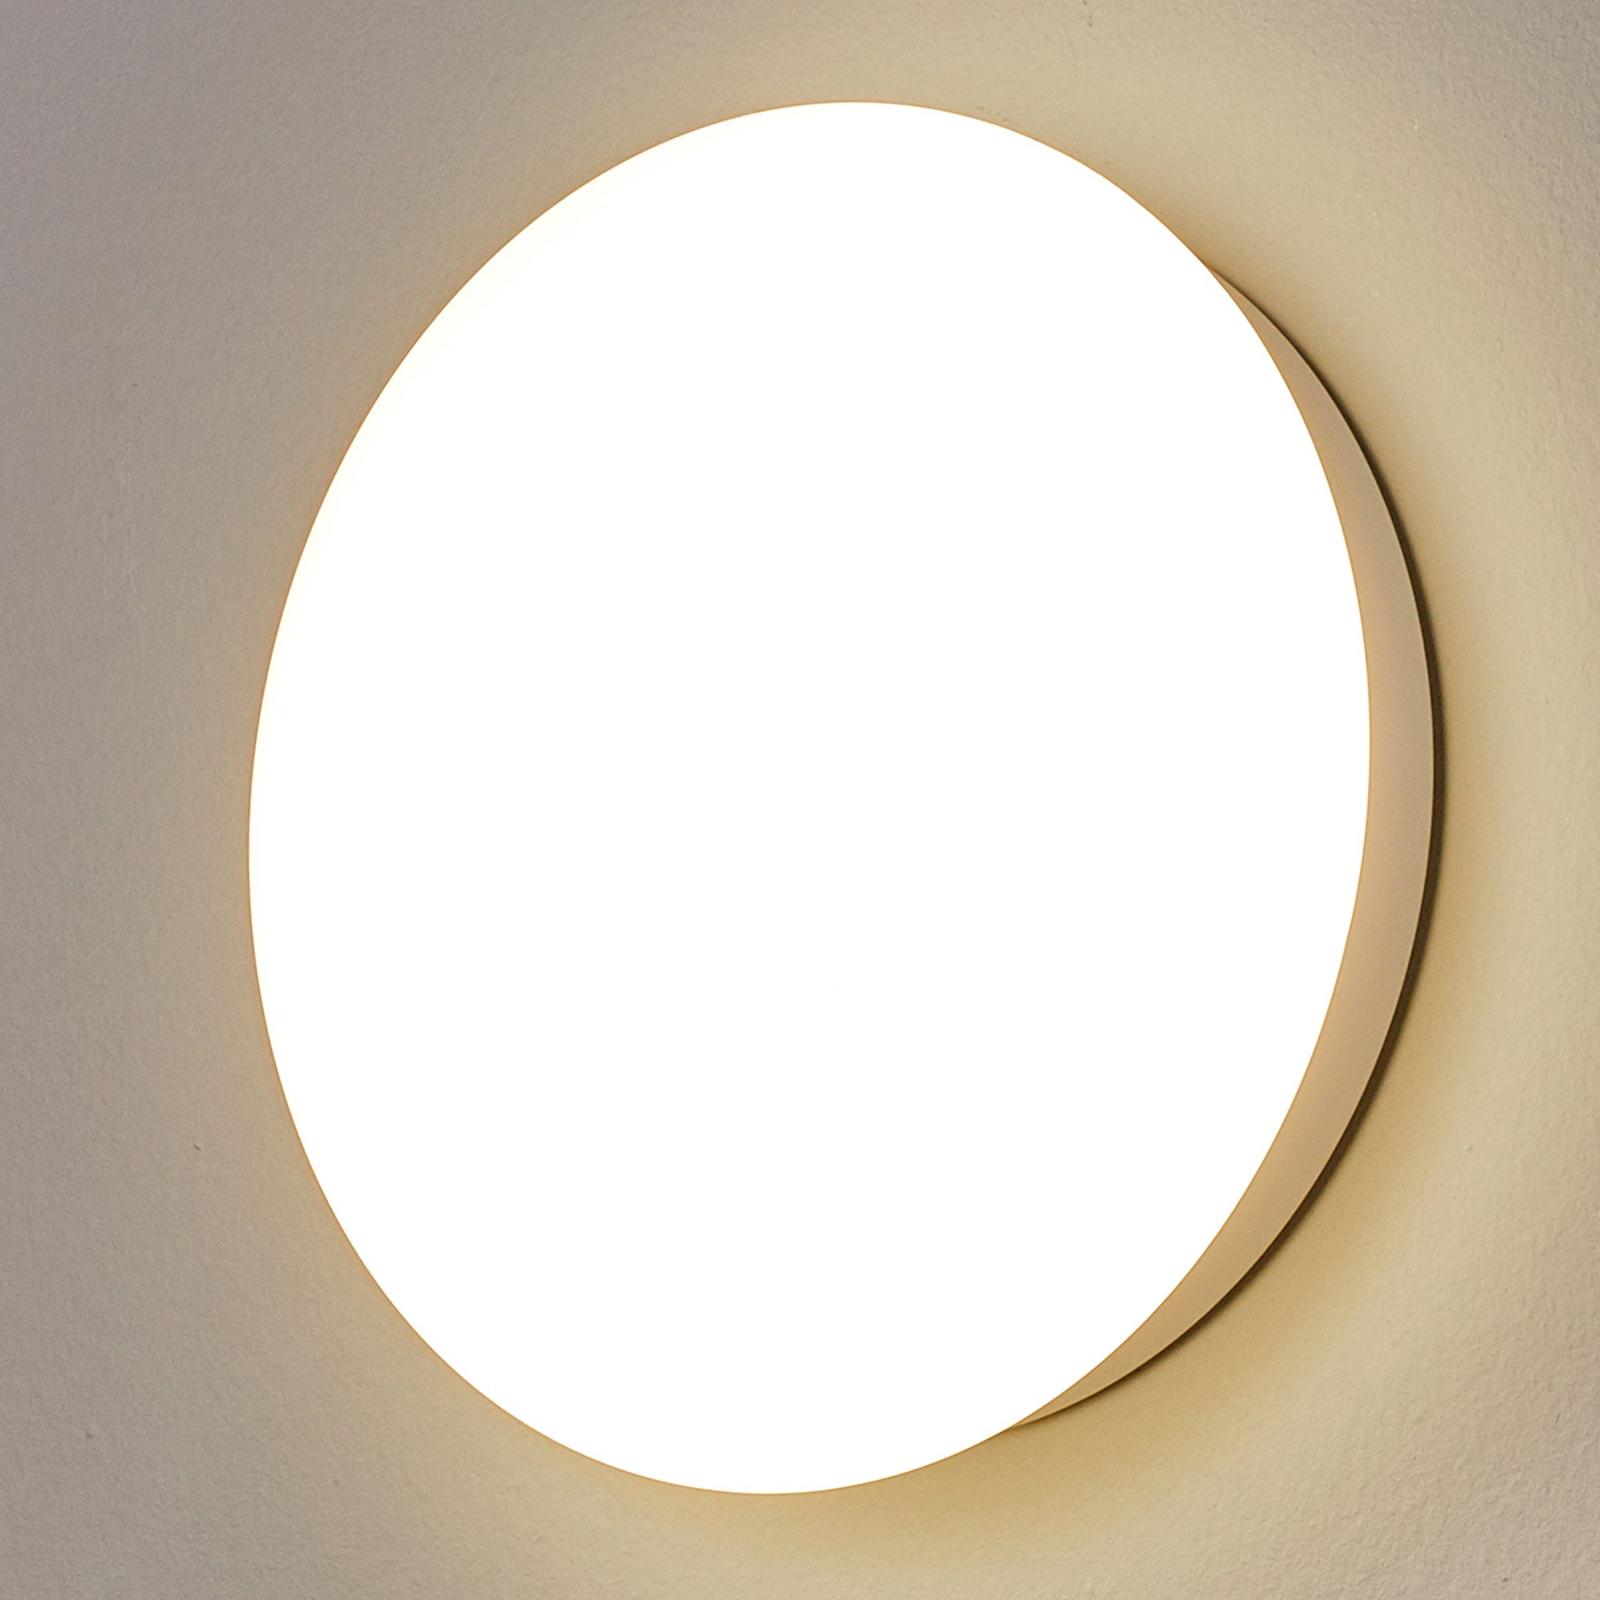 LED-vägglampa Sun 12 IP55, 13 W 3000K vv